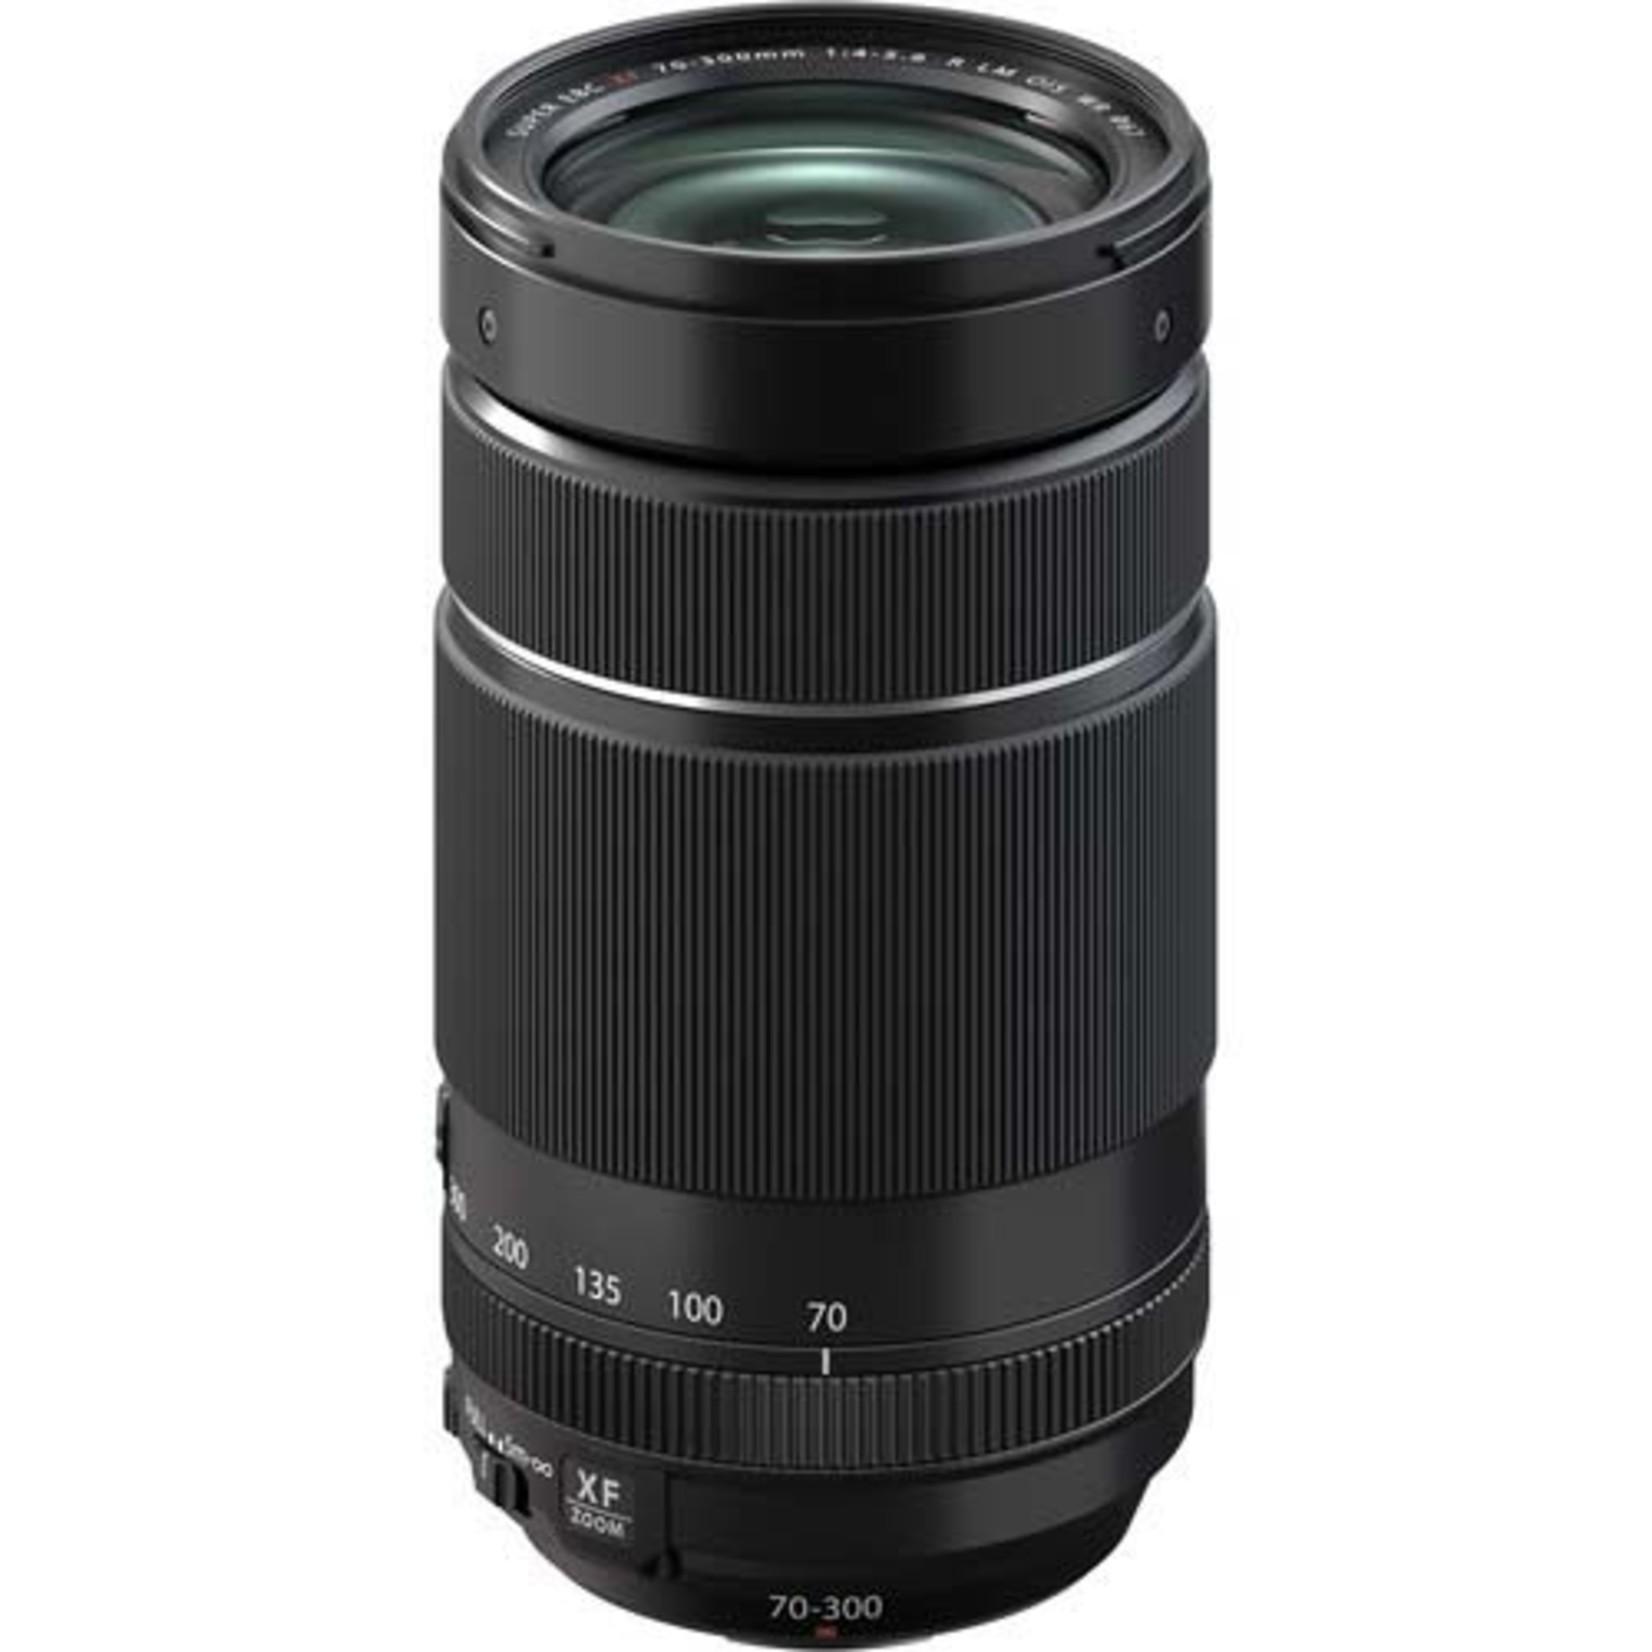 FujiFilm FujiFilm XF 70-300mm f/4-5.6 R LM OIS WR Lens